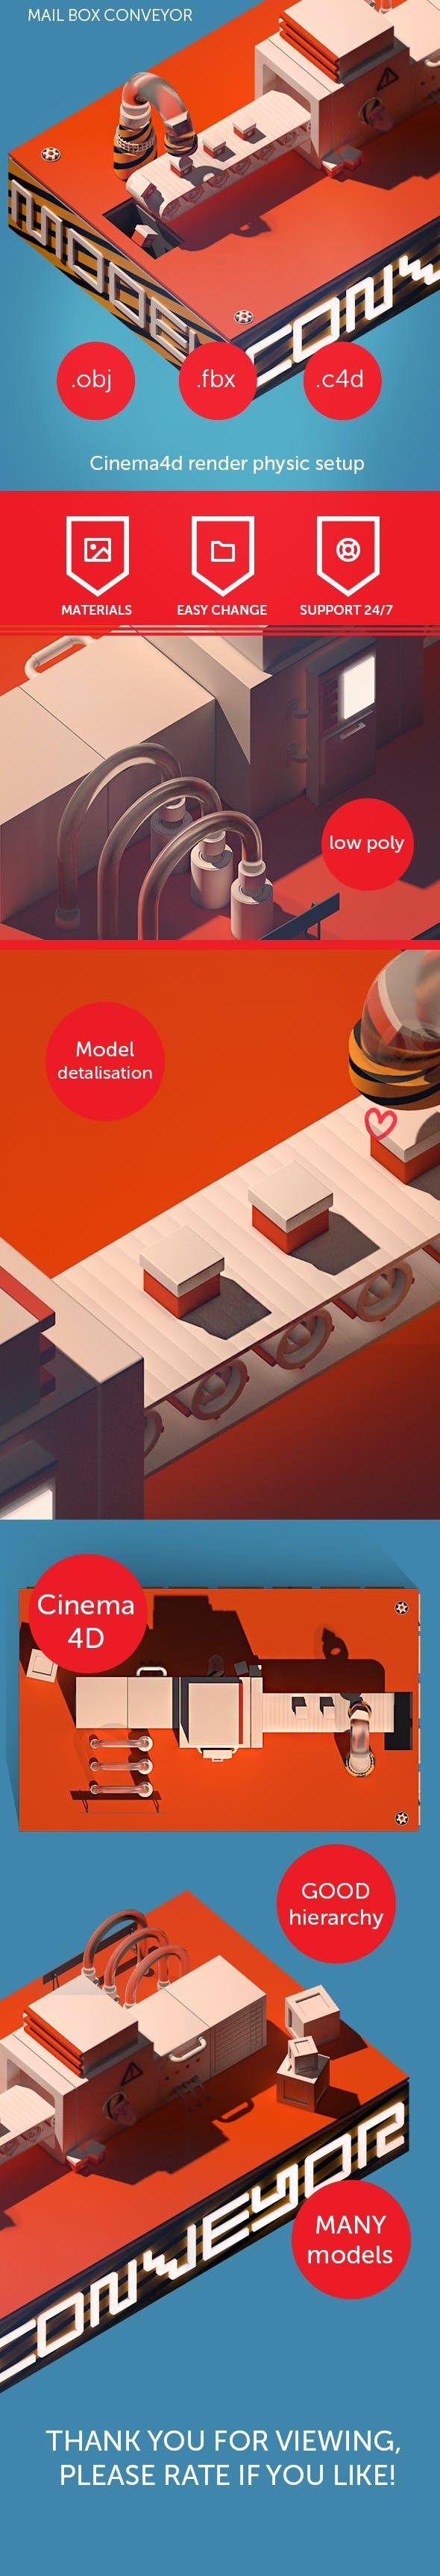 Mail box conveyor - 3DOcean Item for Sale